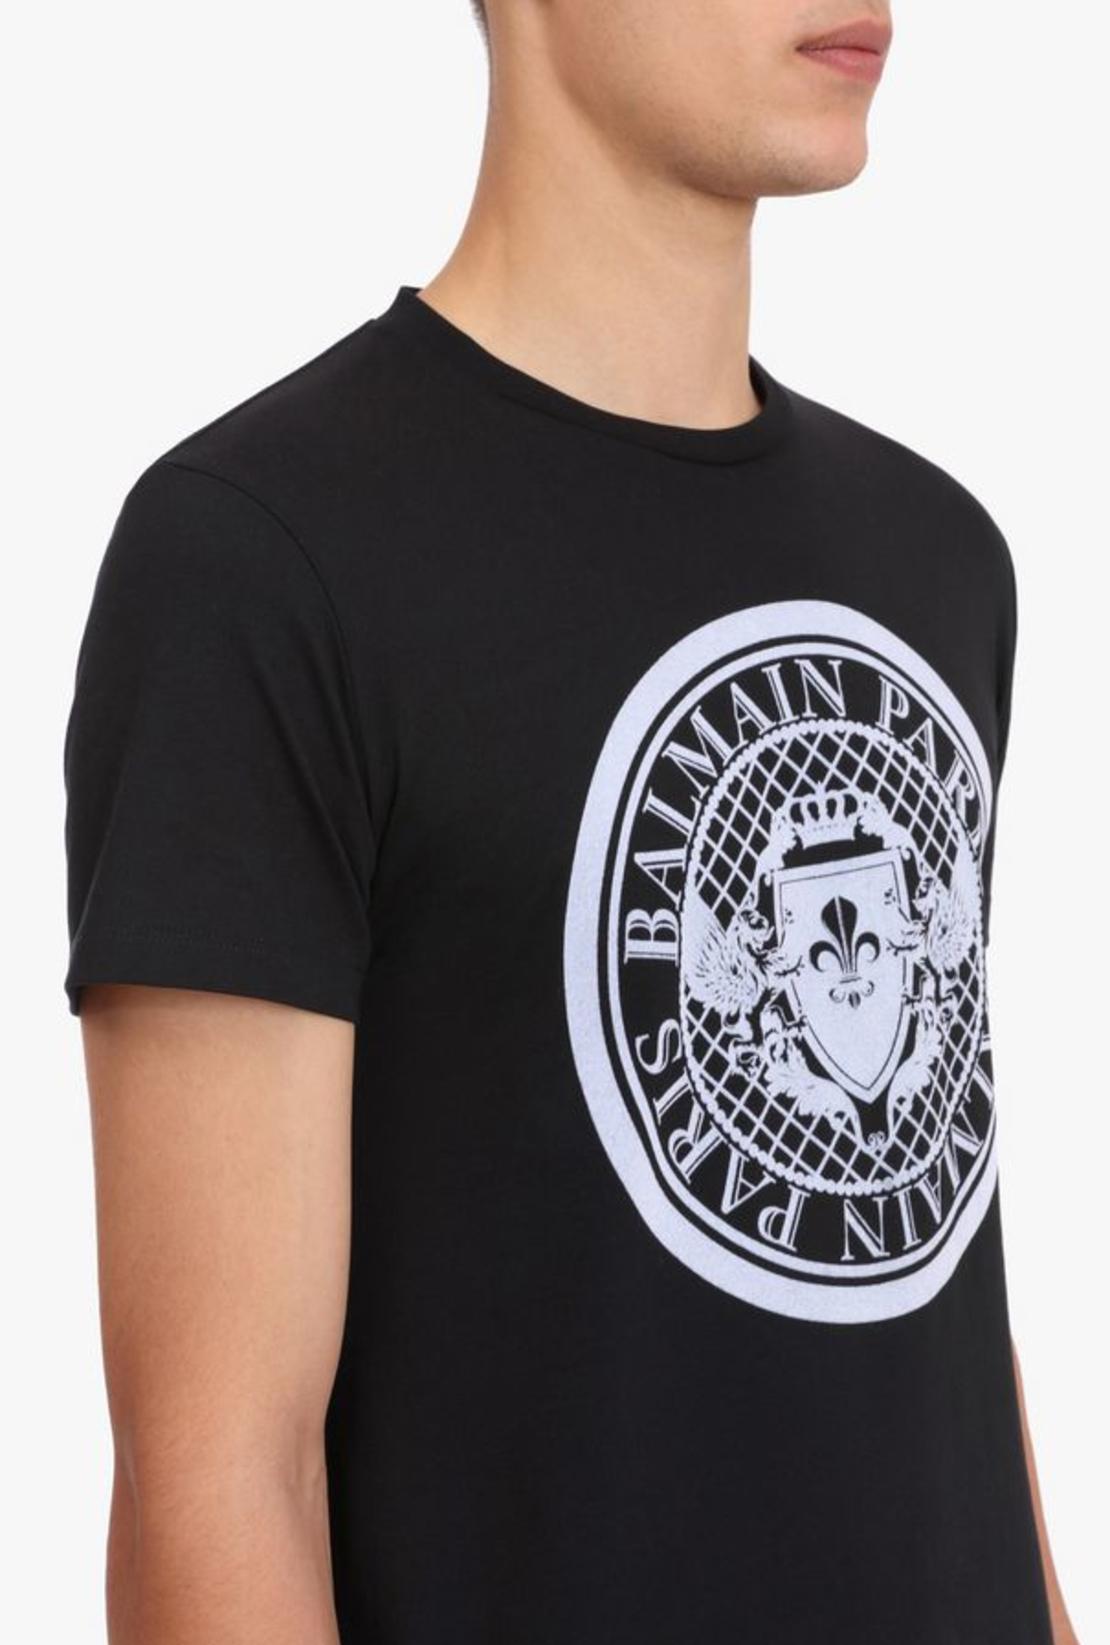 BALMAIN -  T-shirt With Balmain Medallion Print  -BLACK